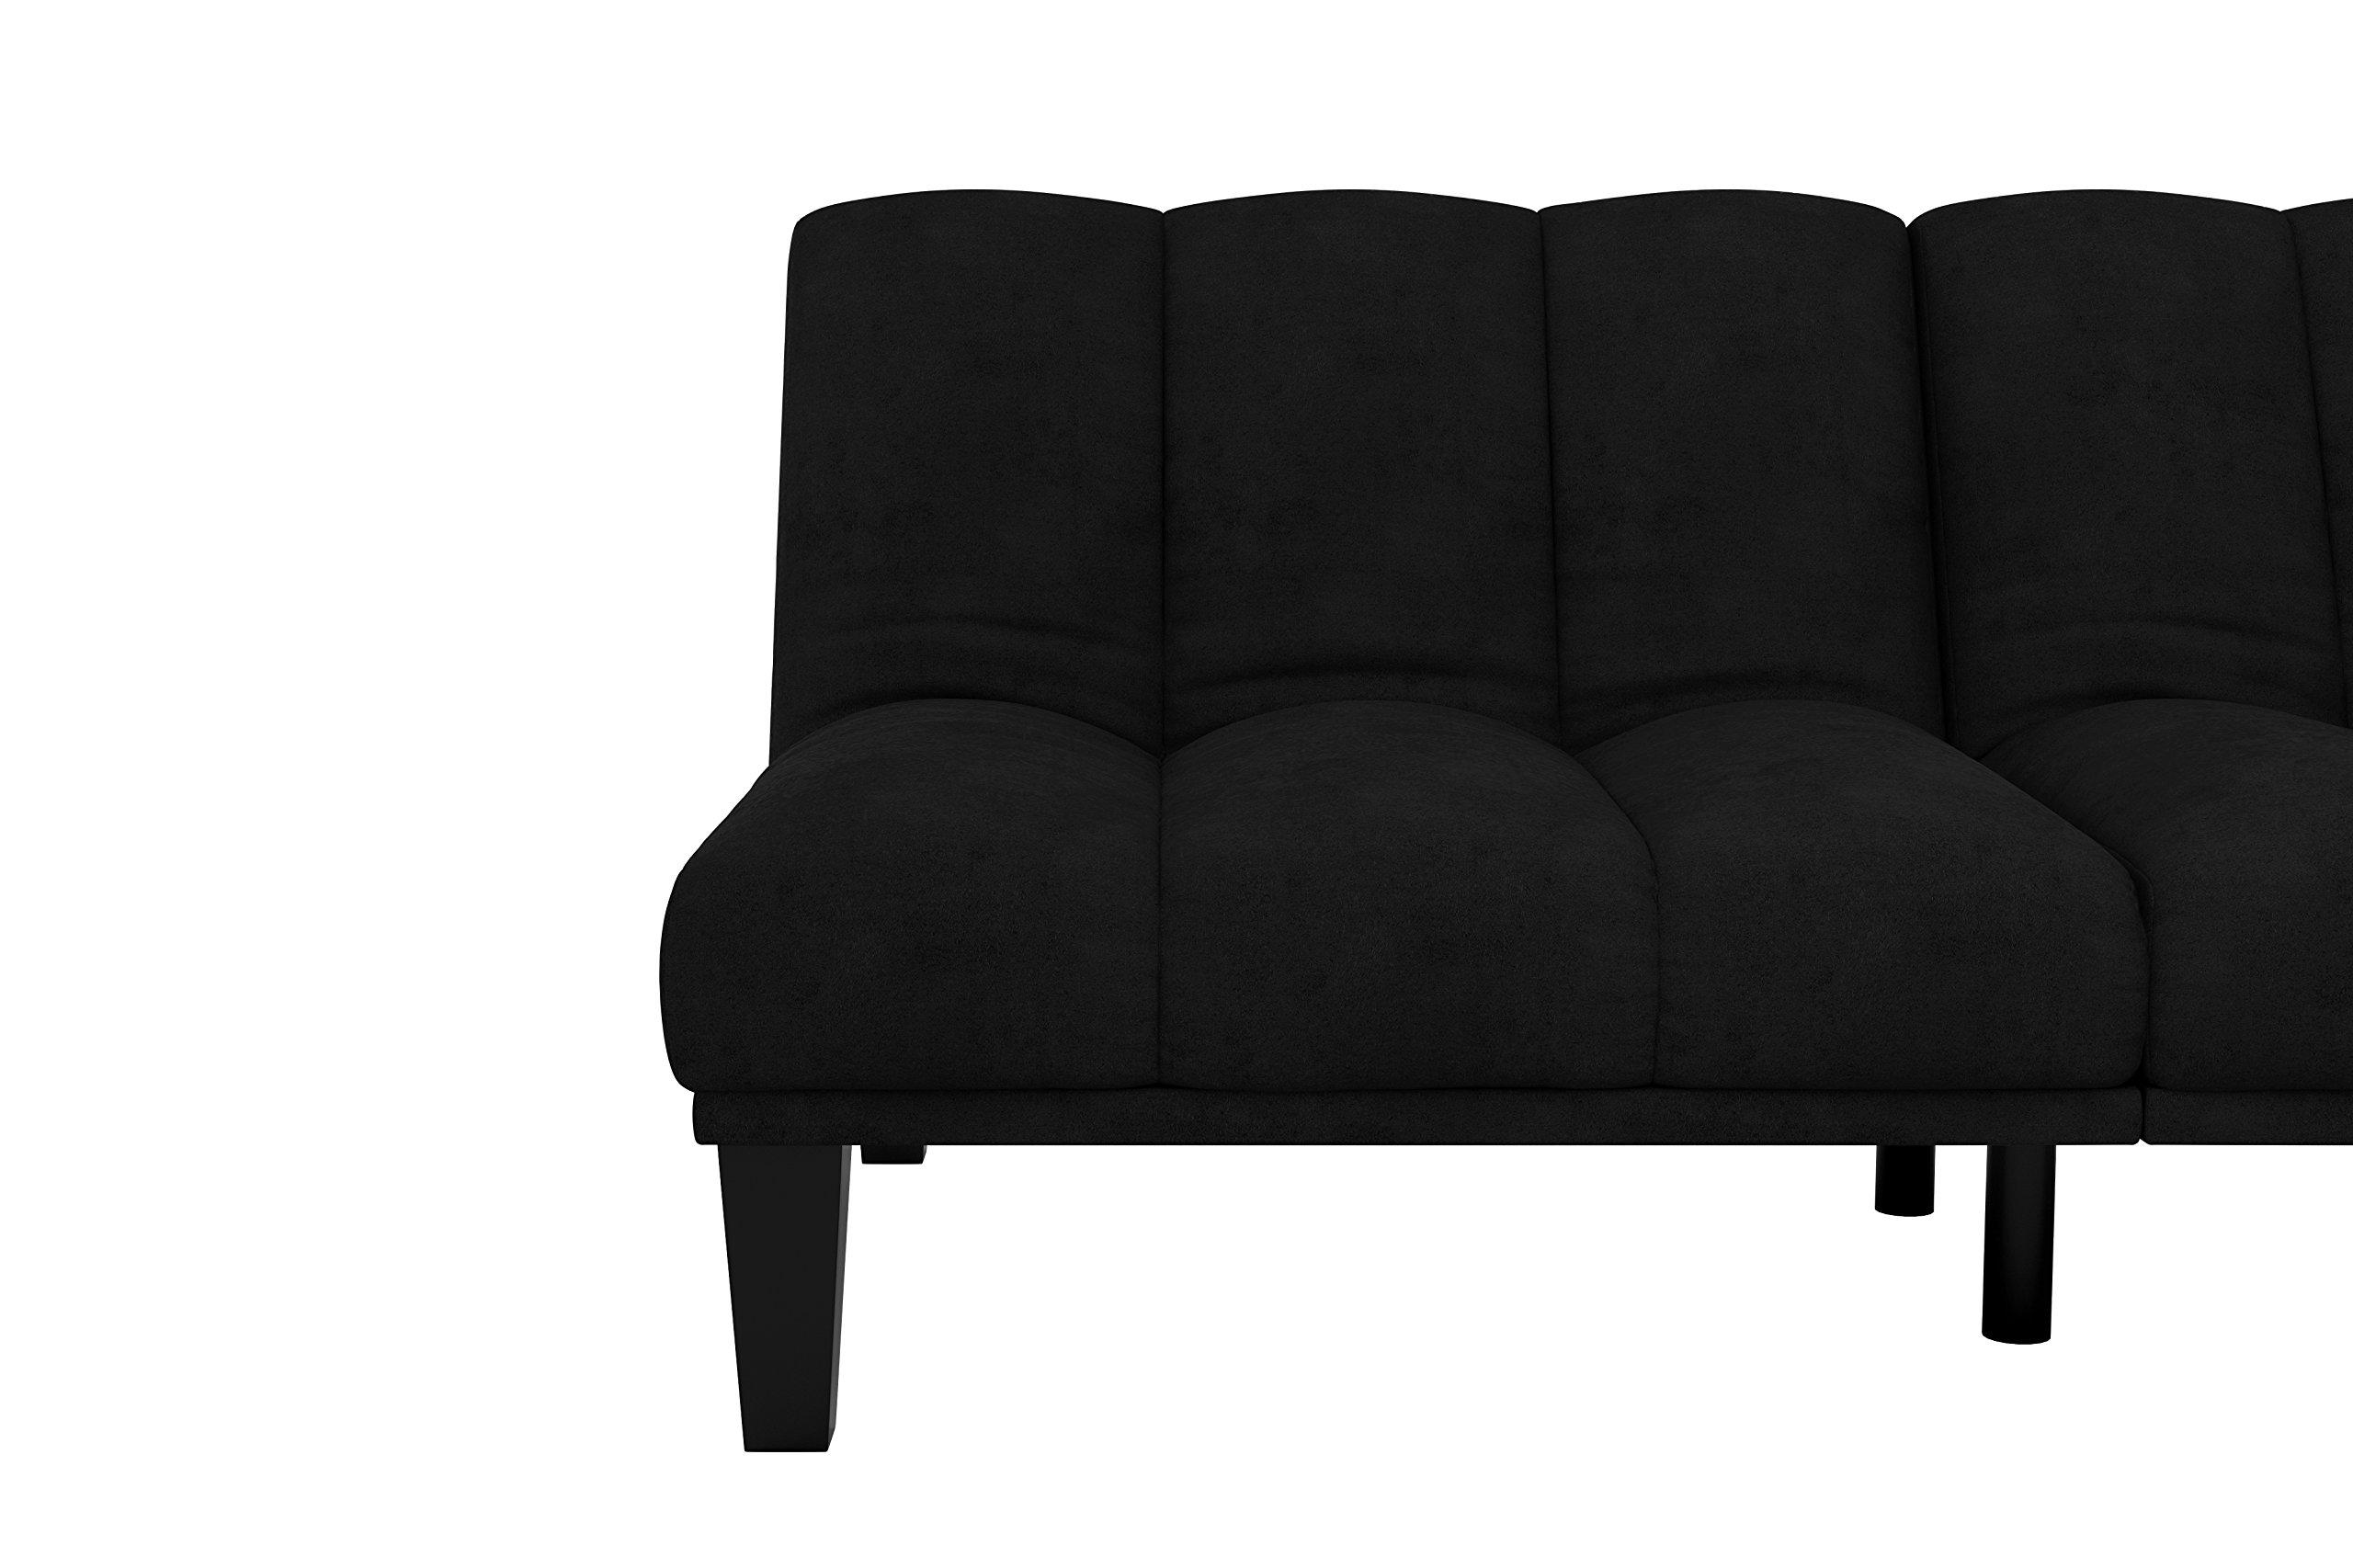 Hamilton Estate Premium Sofa Futon Sleeper Comfortable Plush Upholstery, Rich Black by DHP (Image #9)